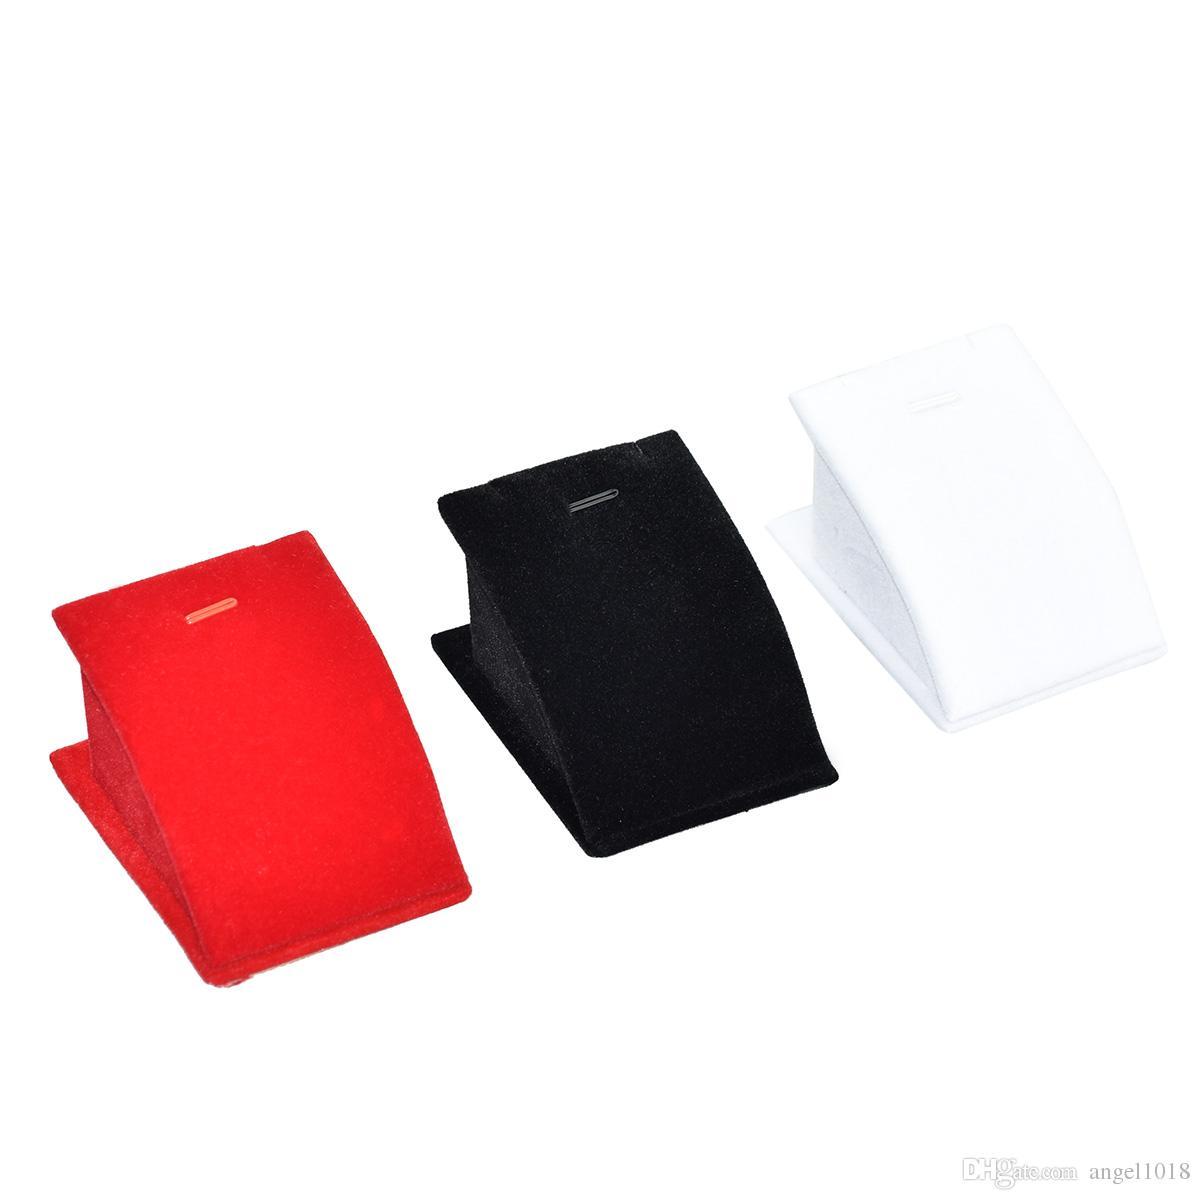 Argositment White Red Black Velvet Mini Necklace Pendant Jewelry Display Rack with Hook10 pack